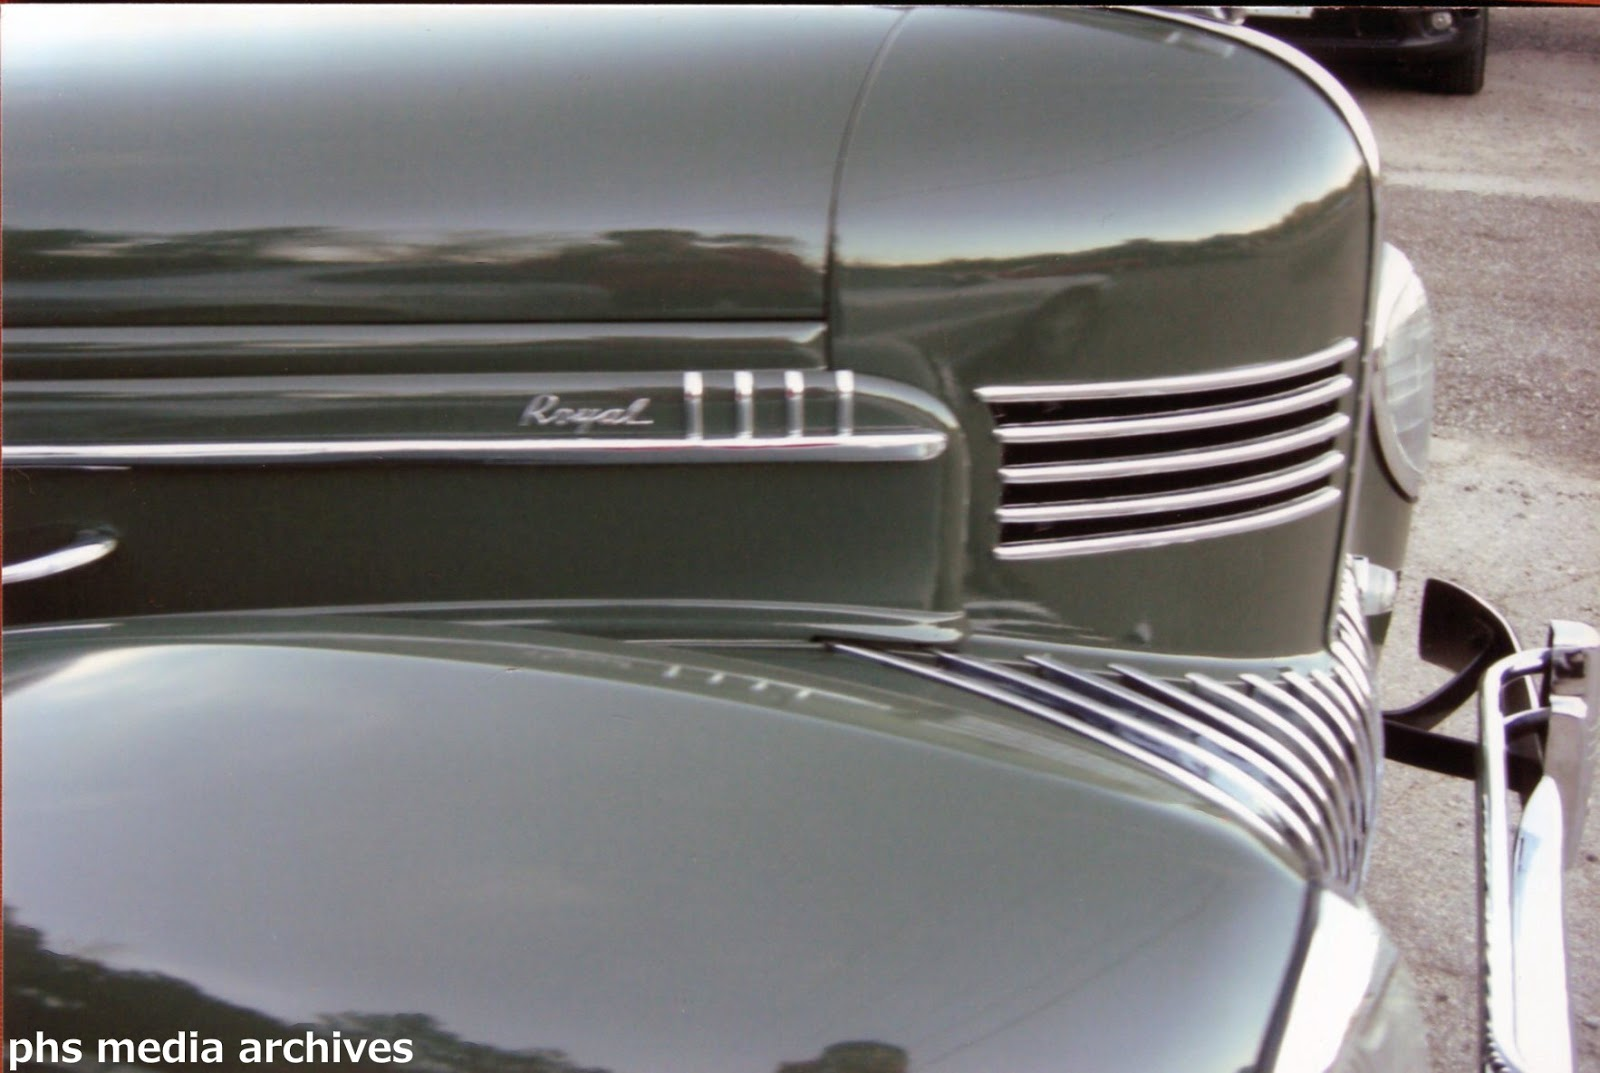 American Classic: 1939 Chrysler Royal sedan